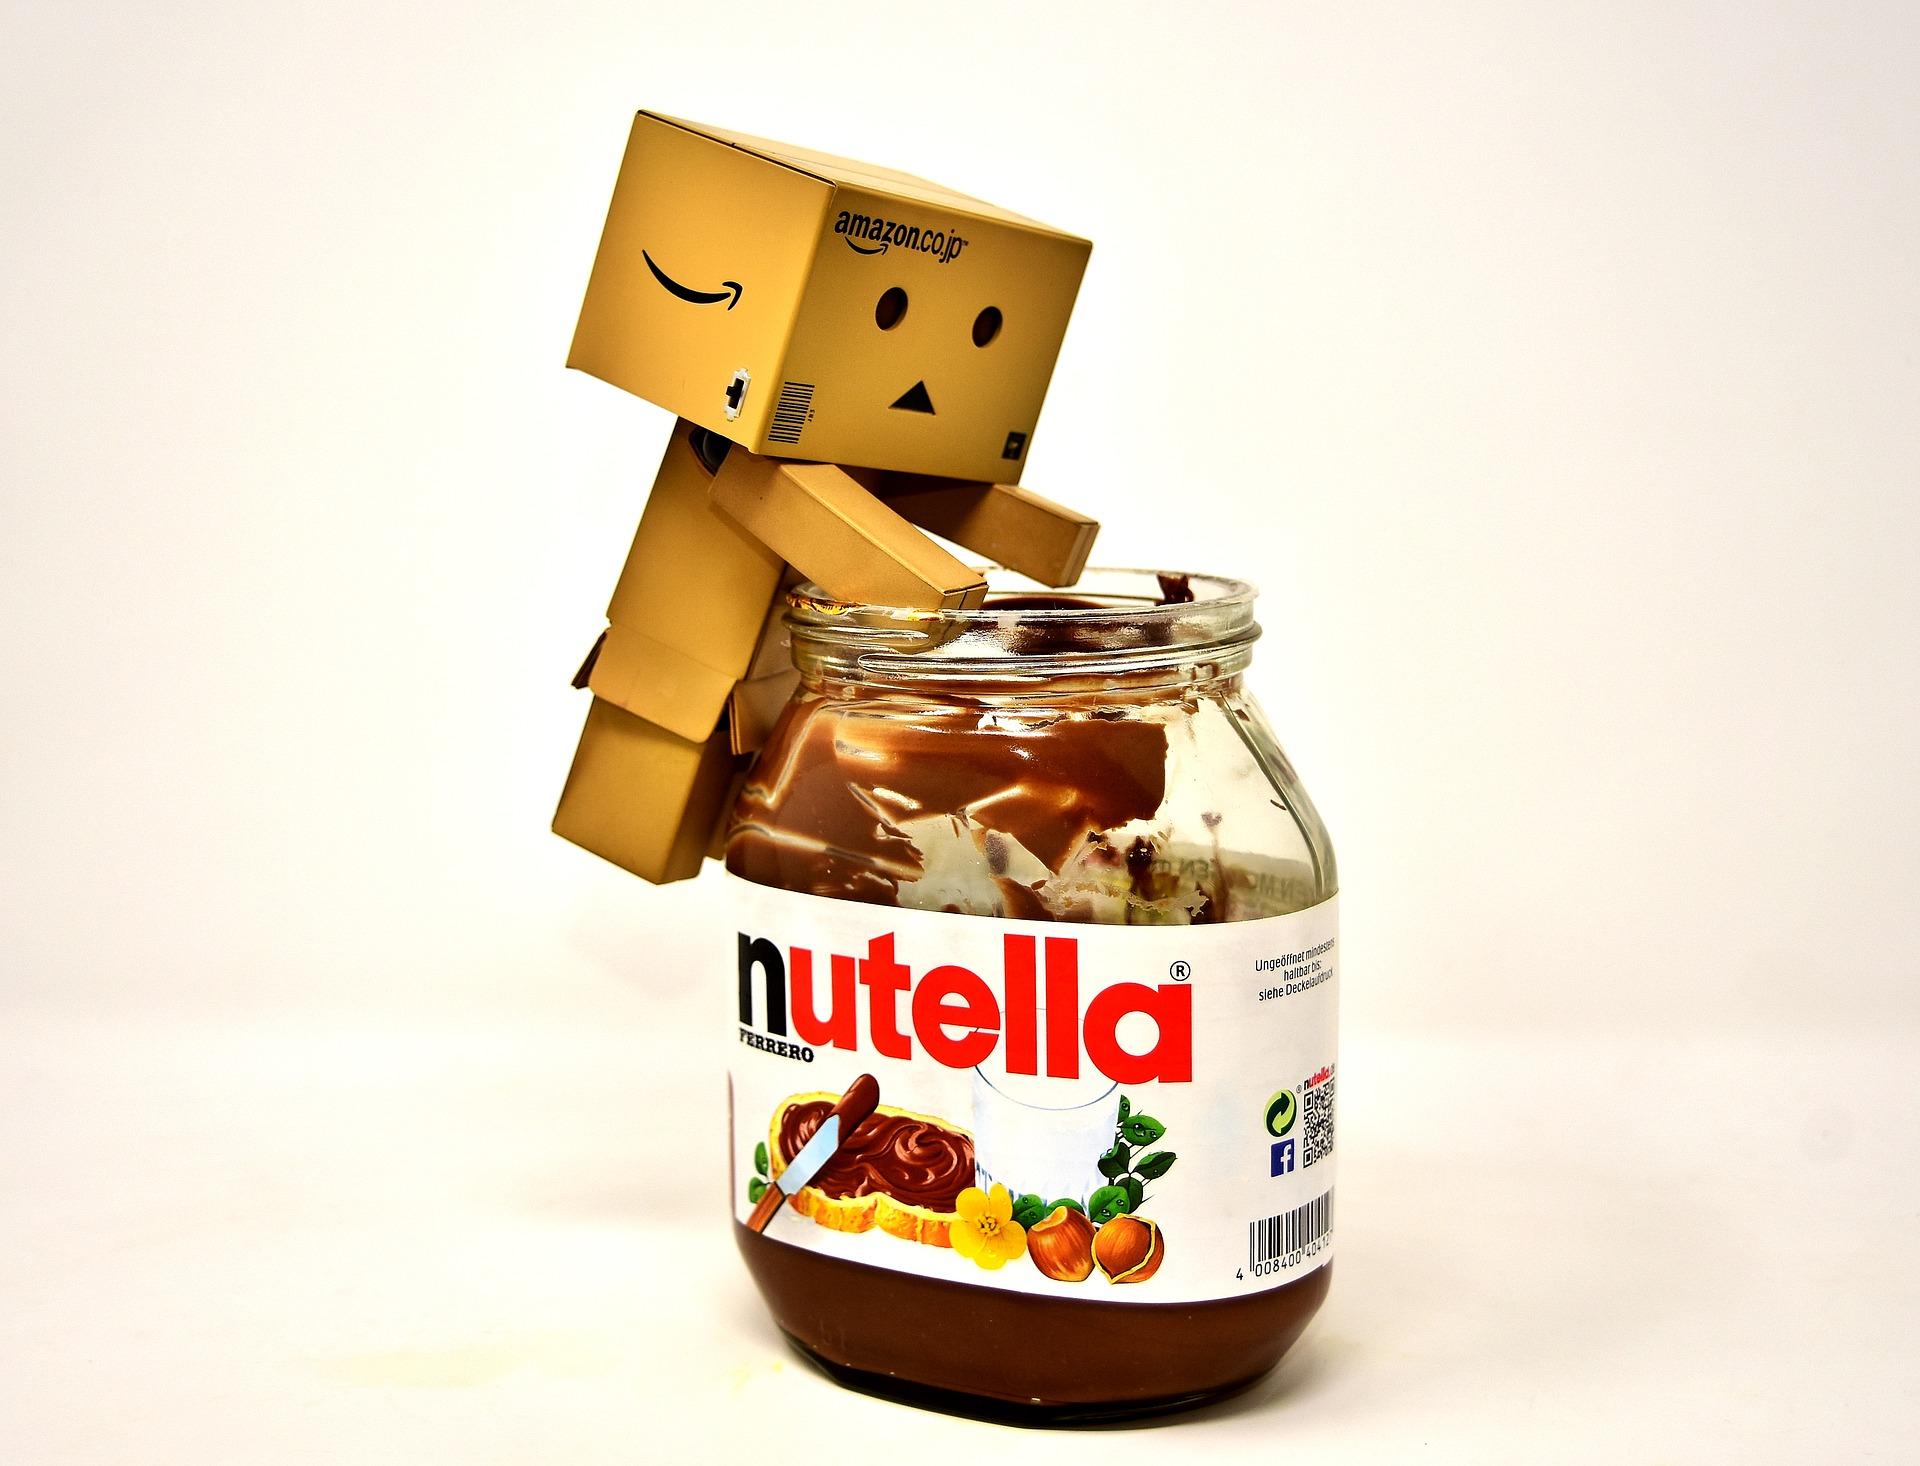 Le Nutella fait-il grossir ?